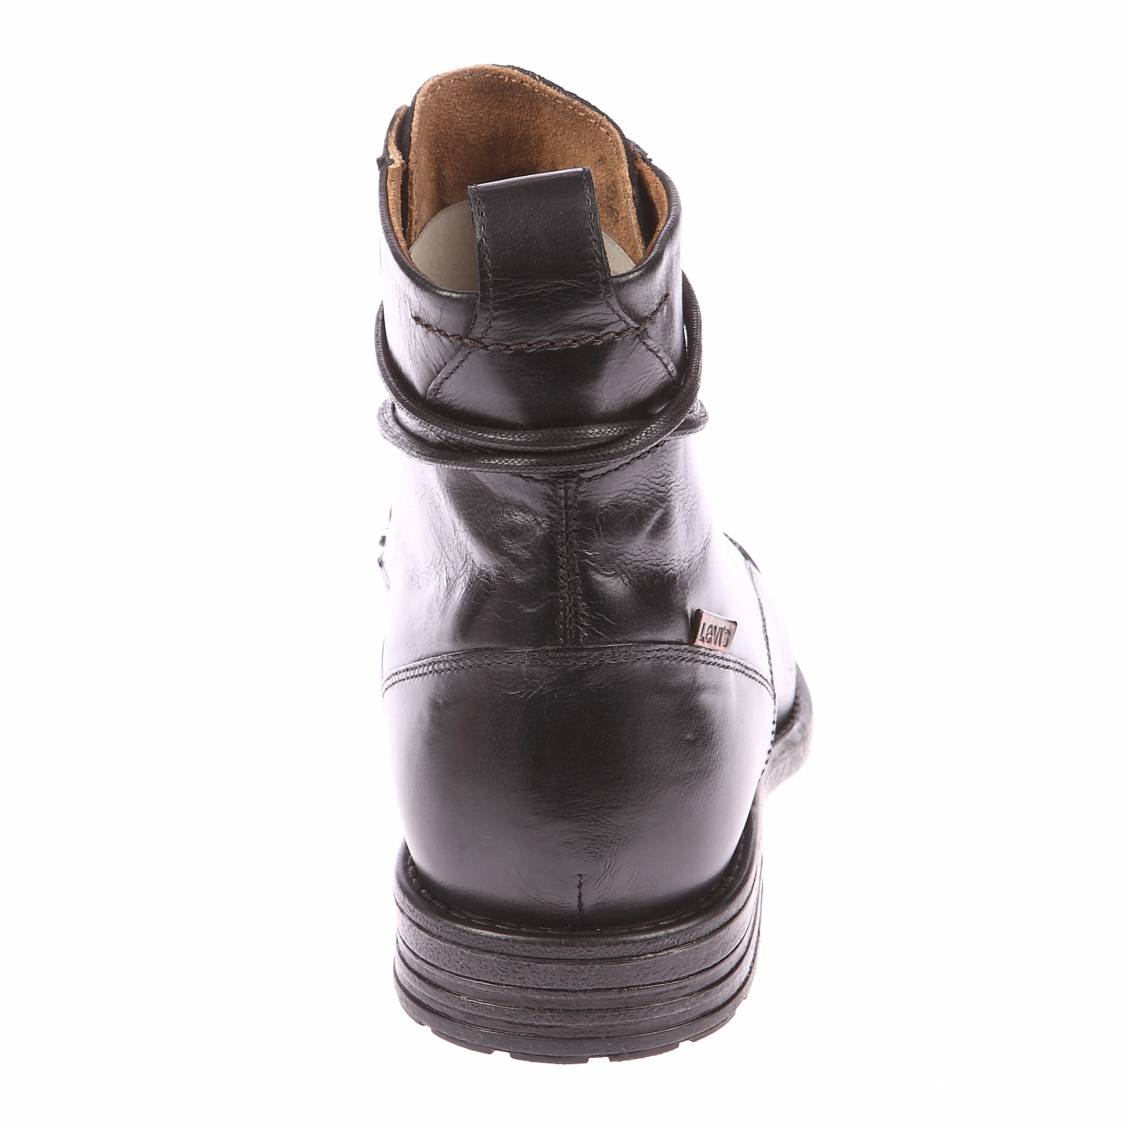 bottines levi 39 s emerson en cuir noir rue des hommes. Black Bedroom Furniture Sets. Home Design Ideas